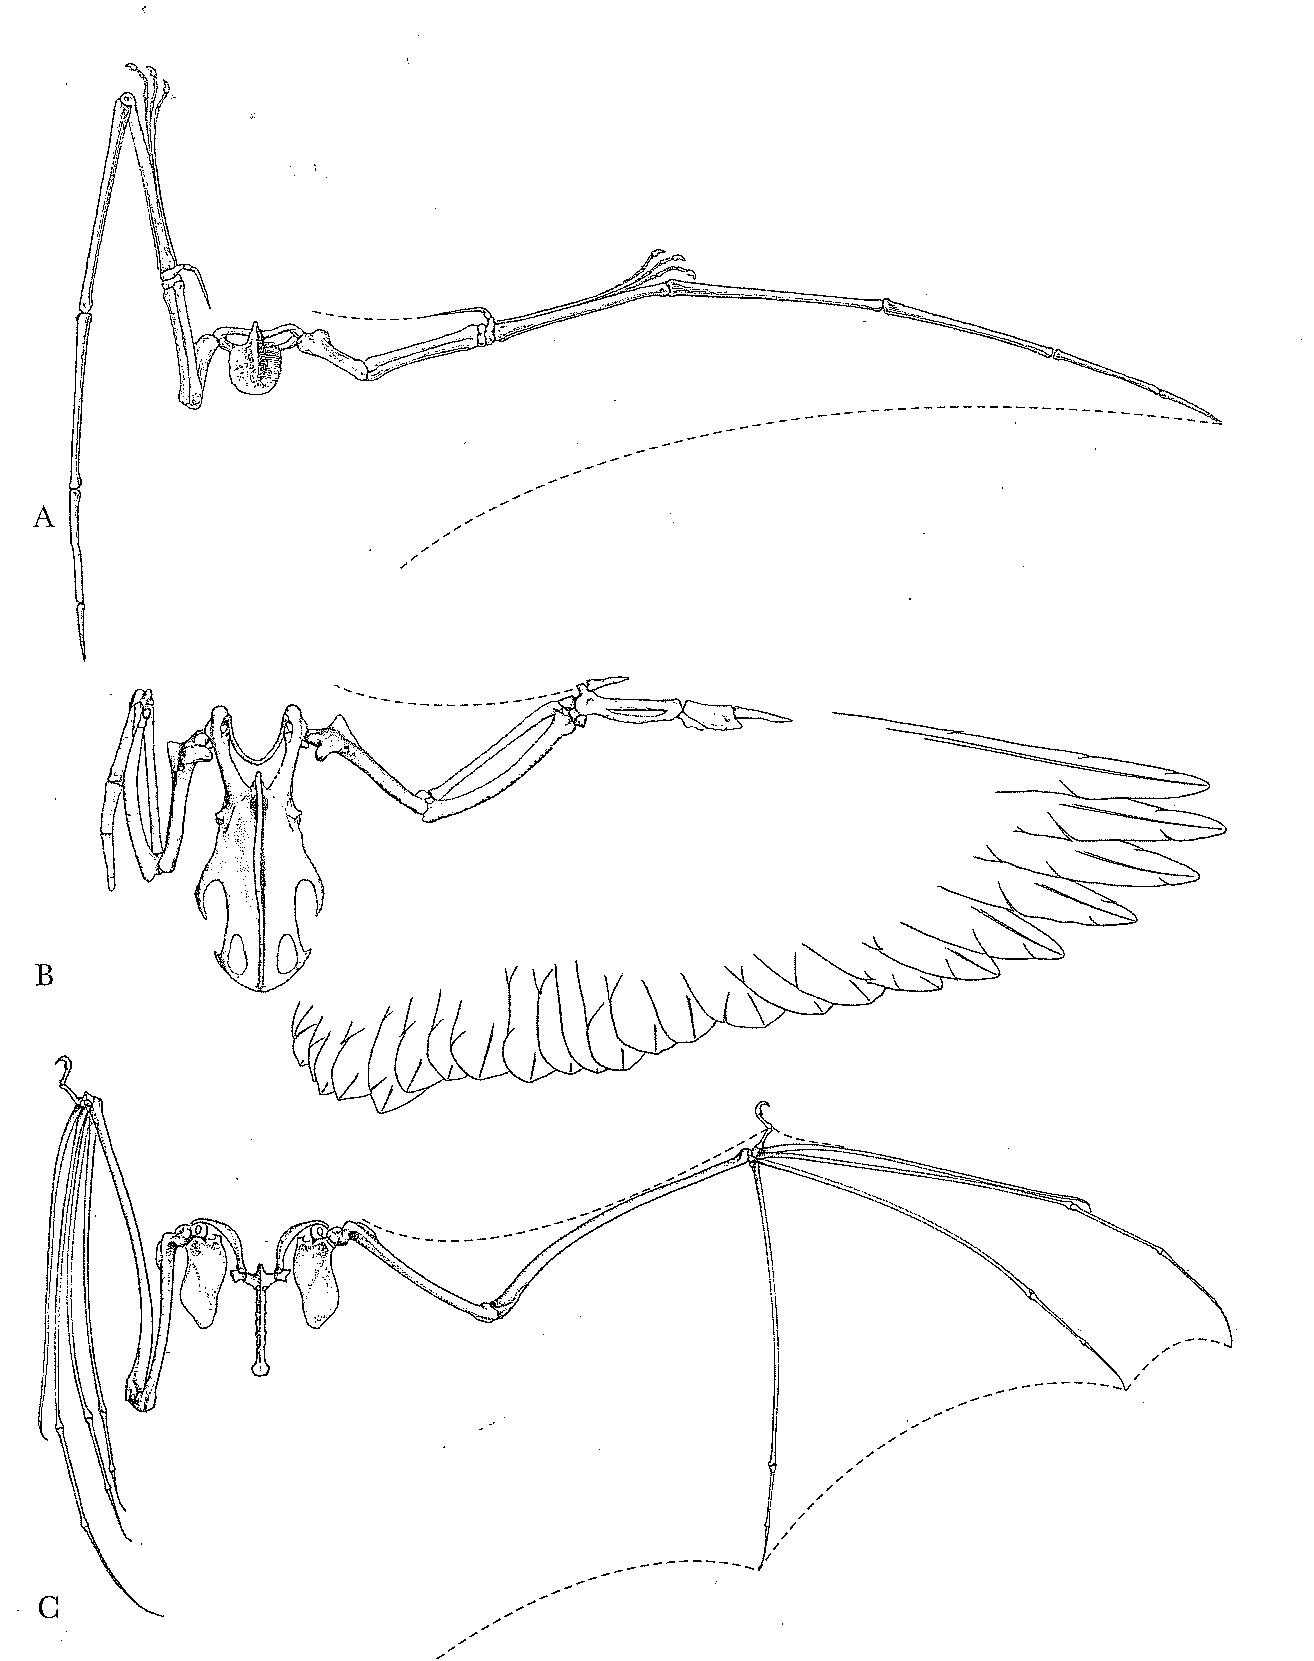 Pterosaur (A), bird (B), and bat (C) wings. Gatesy & Middleton, 2007.